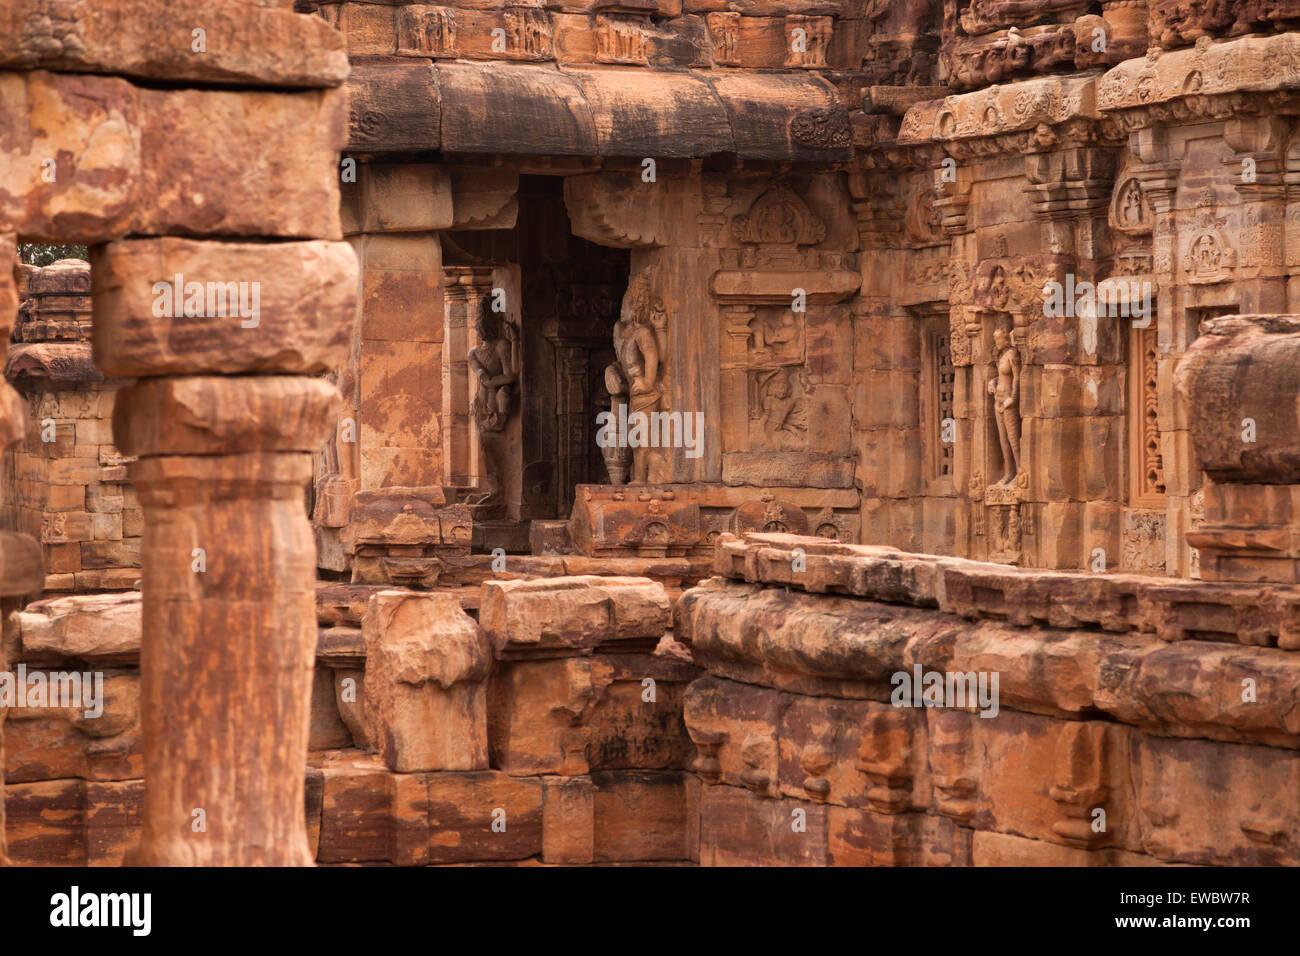 Tempelgebäude aus der Chalukya-Dynastie, UNESCO-Weltkulturerbestätten in Pattadakal, Karnataka, Indien, Stockbild